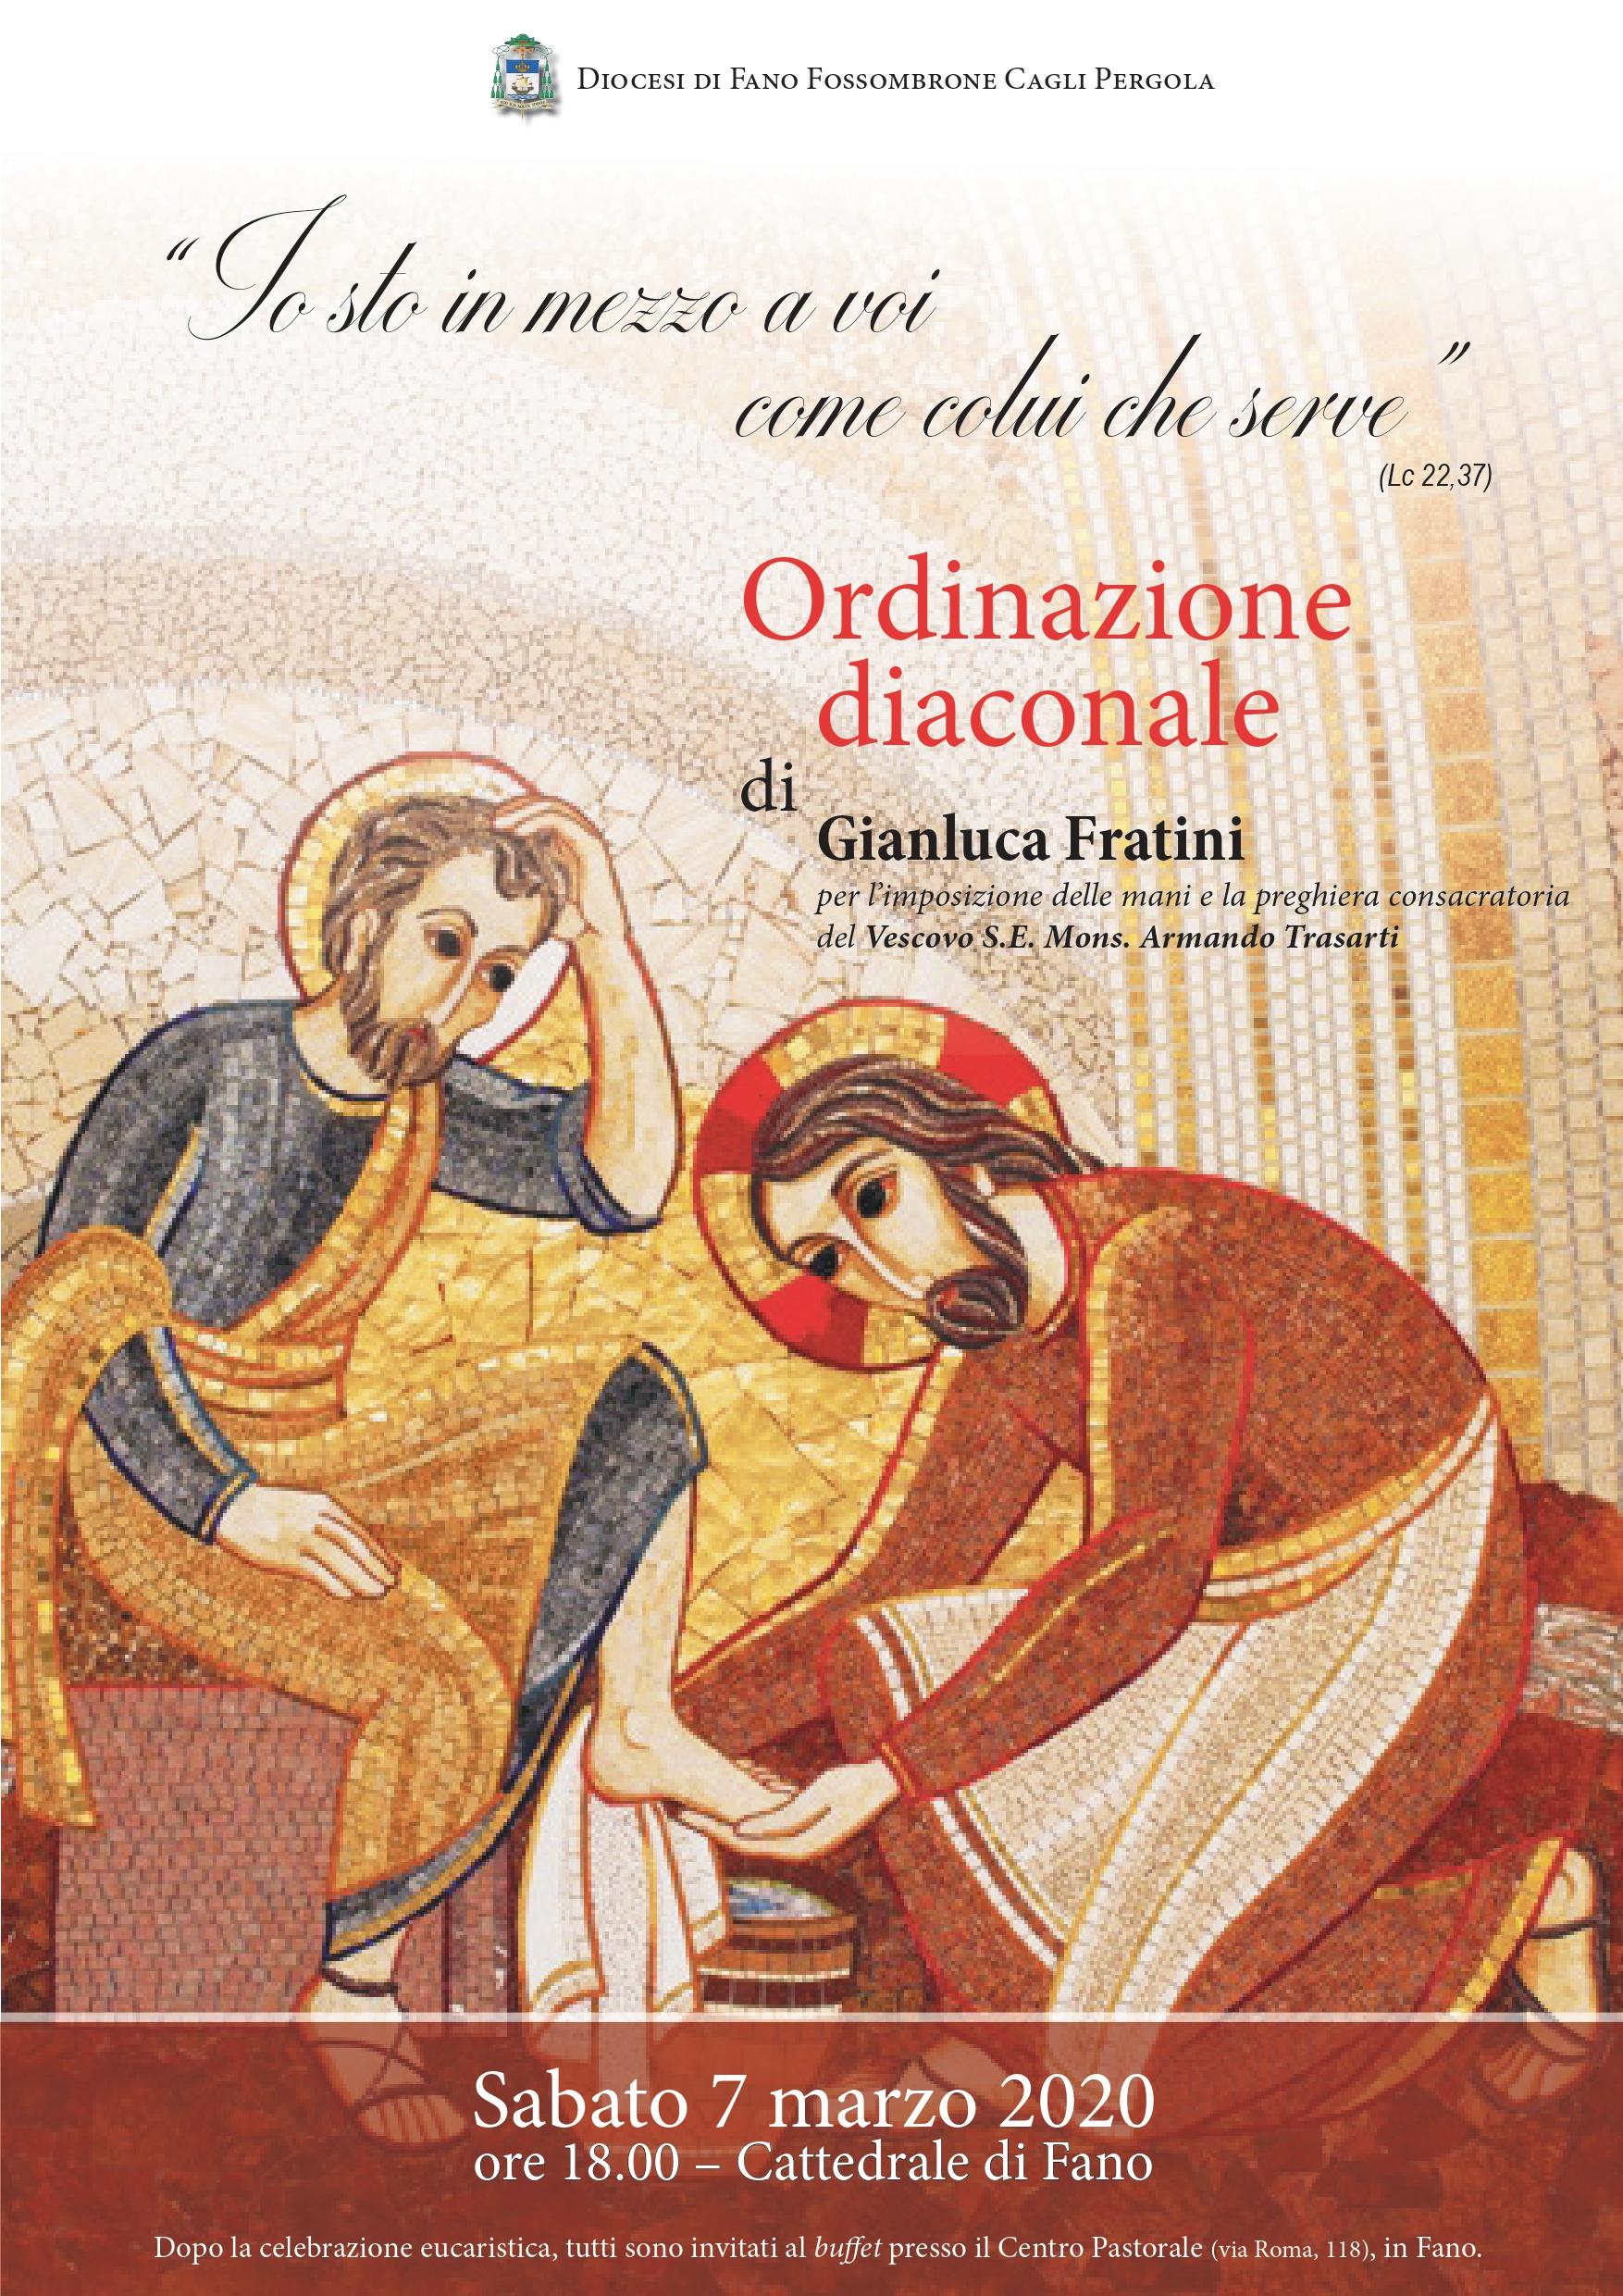 Ordinazione diaconale - Gianluca Fratini LOCANDINA